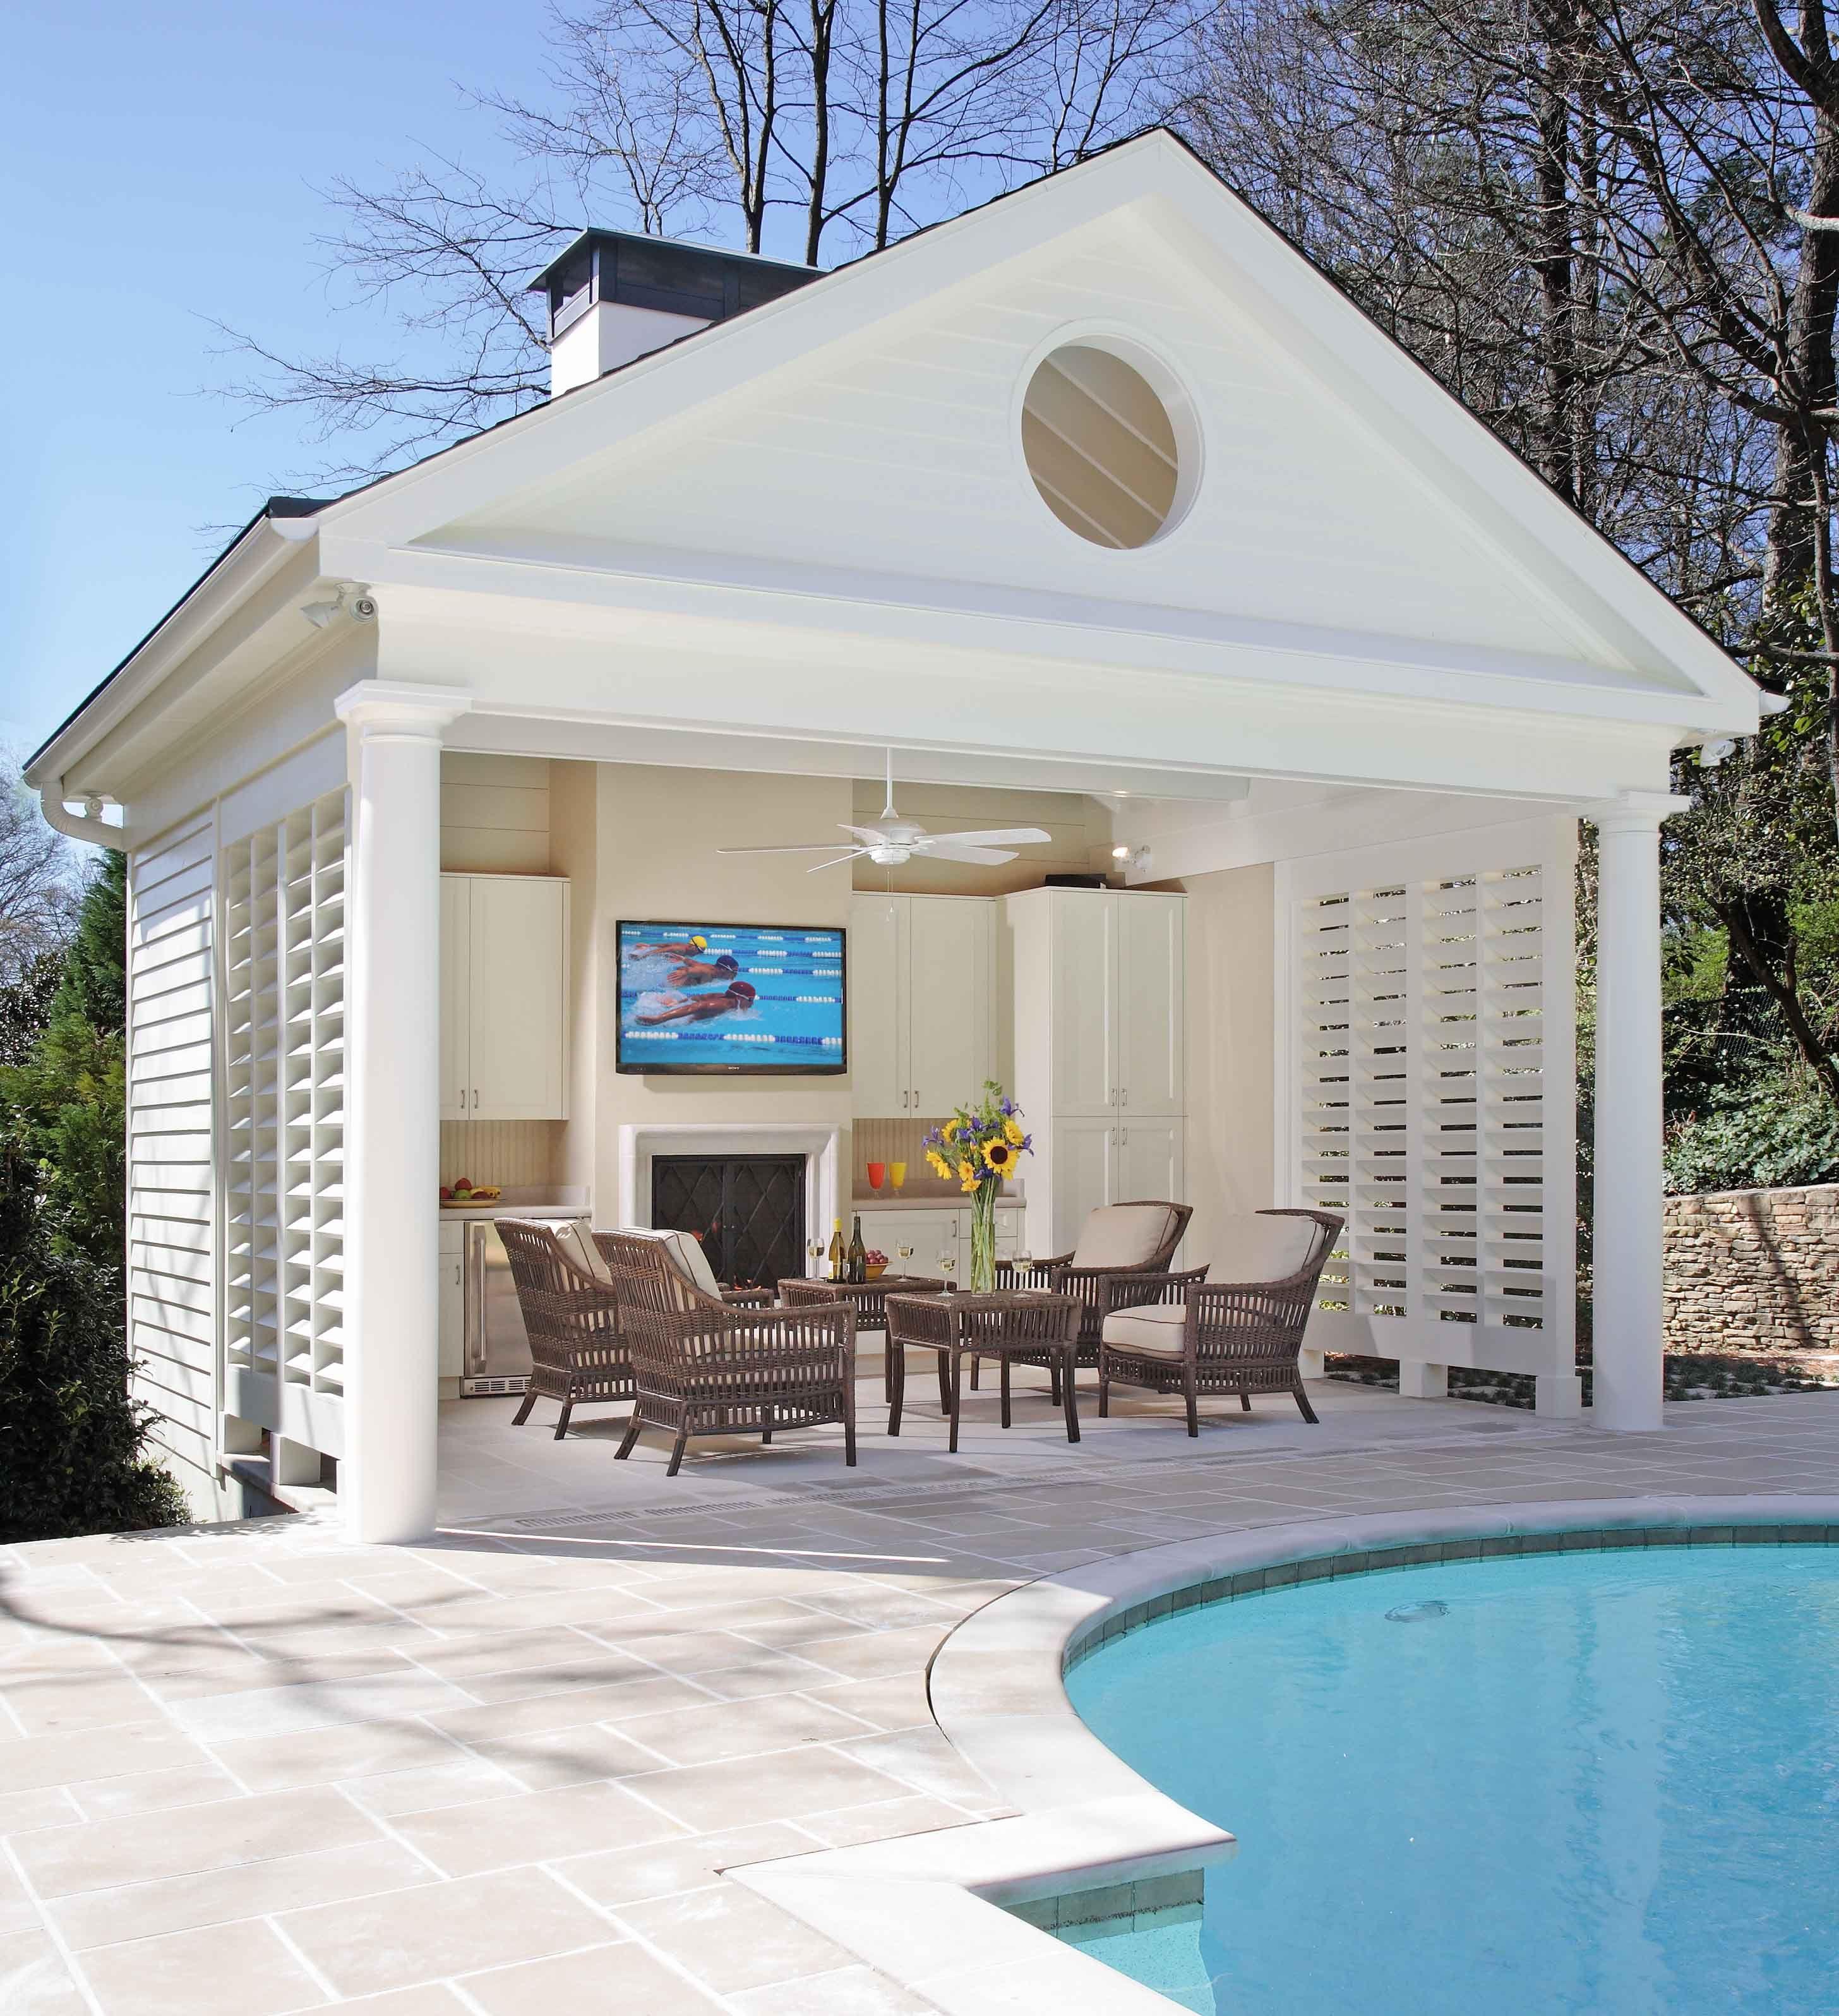 Buckhead pool and cabana with fireplace bahamian shutters